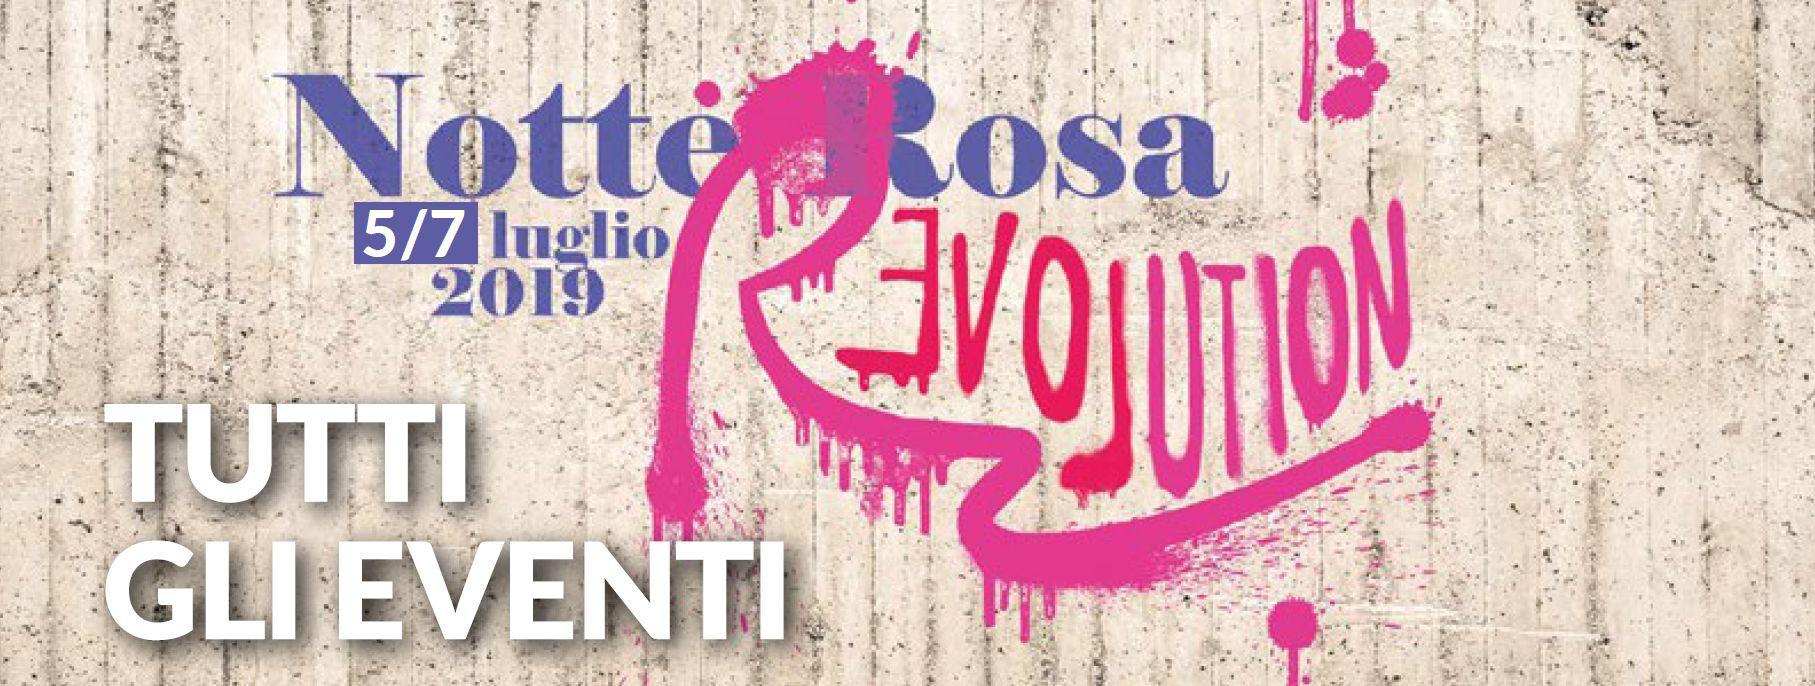 Manifesto Notte Rosa 2019